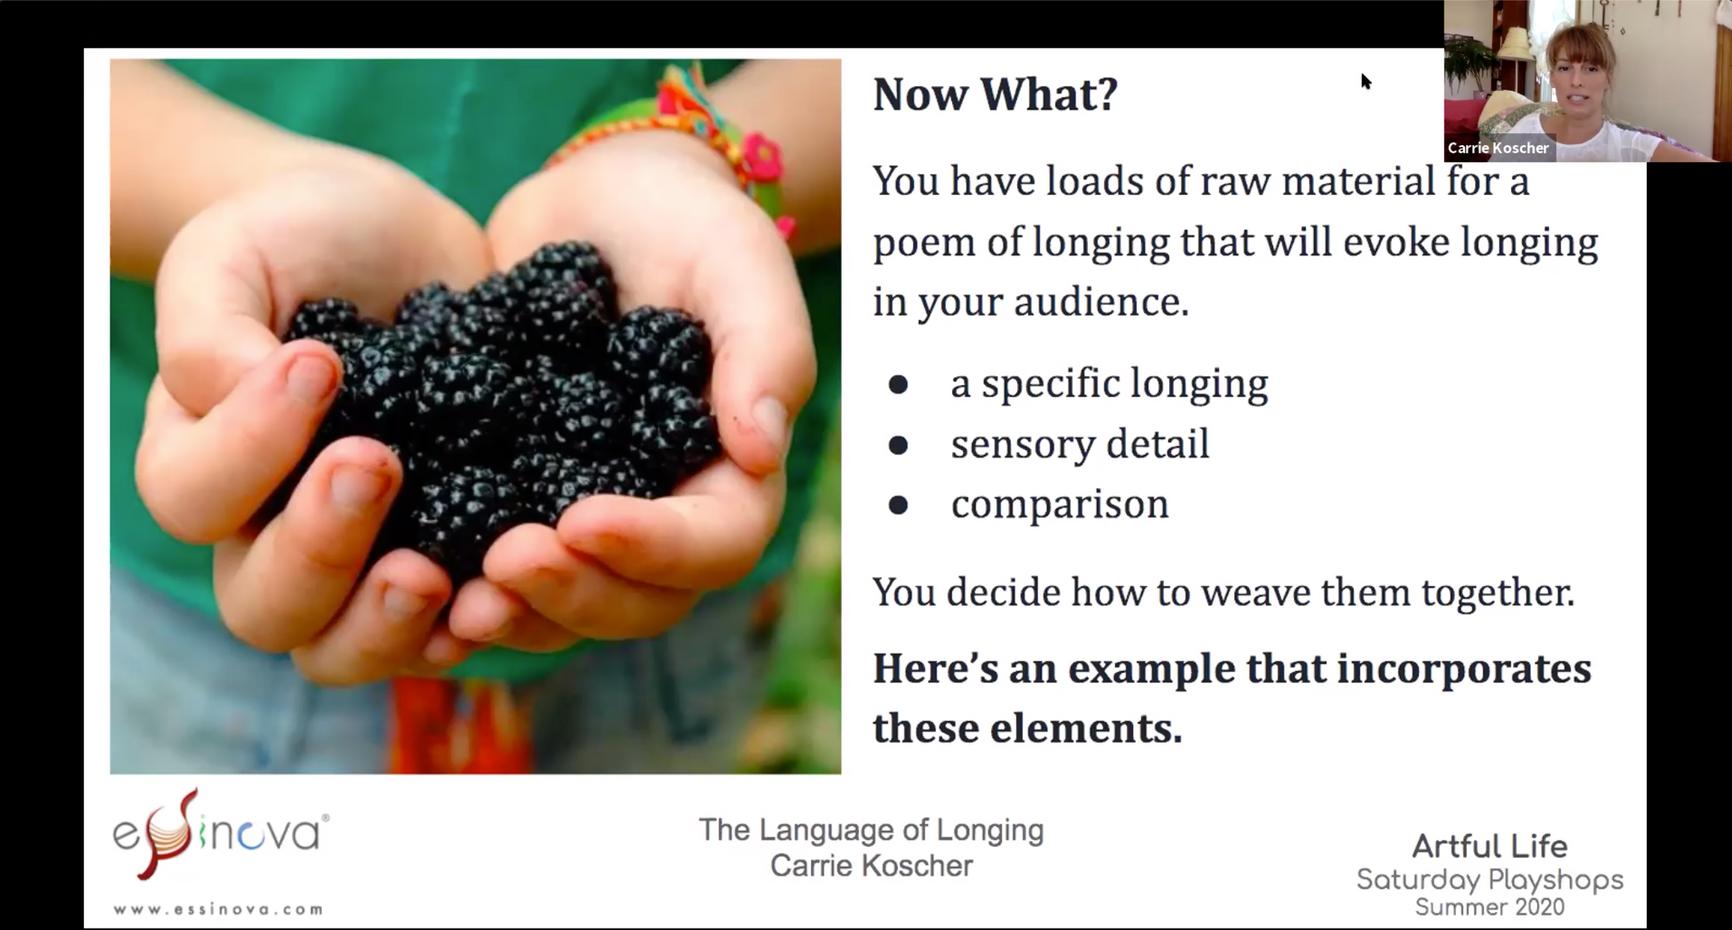 Artful Life 2020 Session 3: The Language of Longing